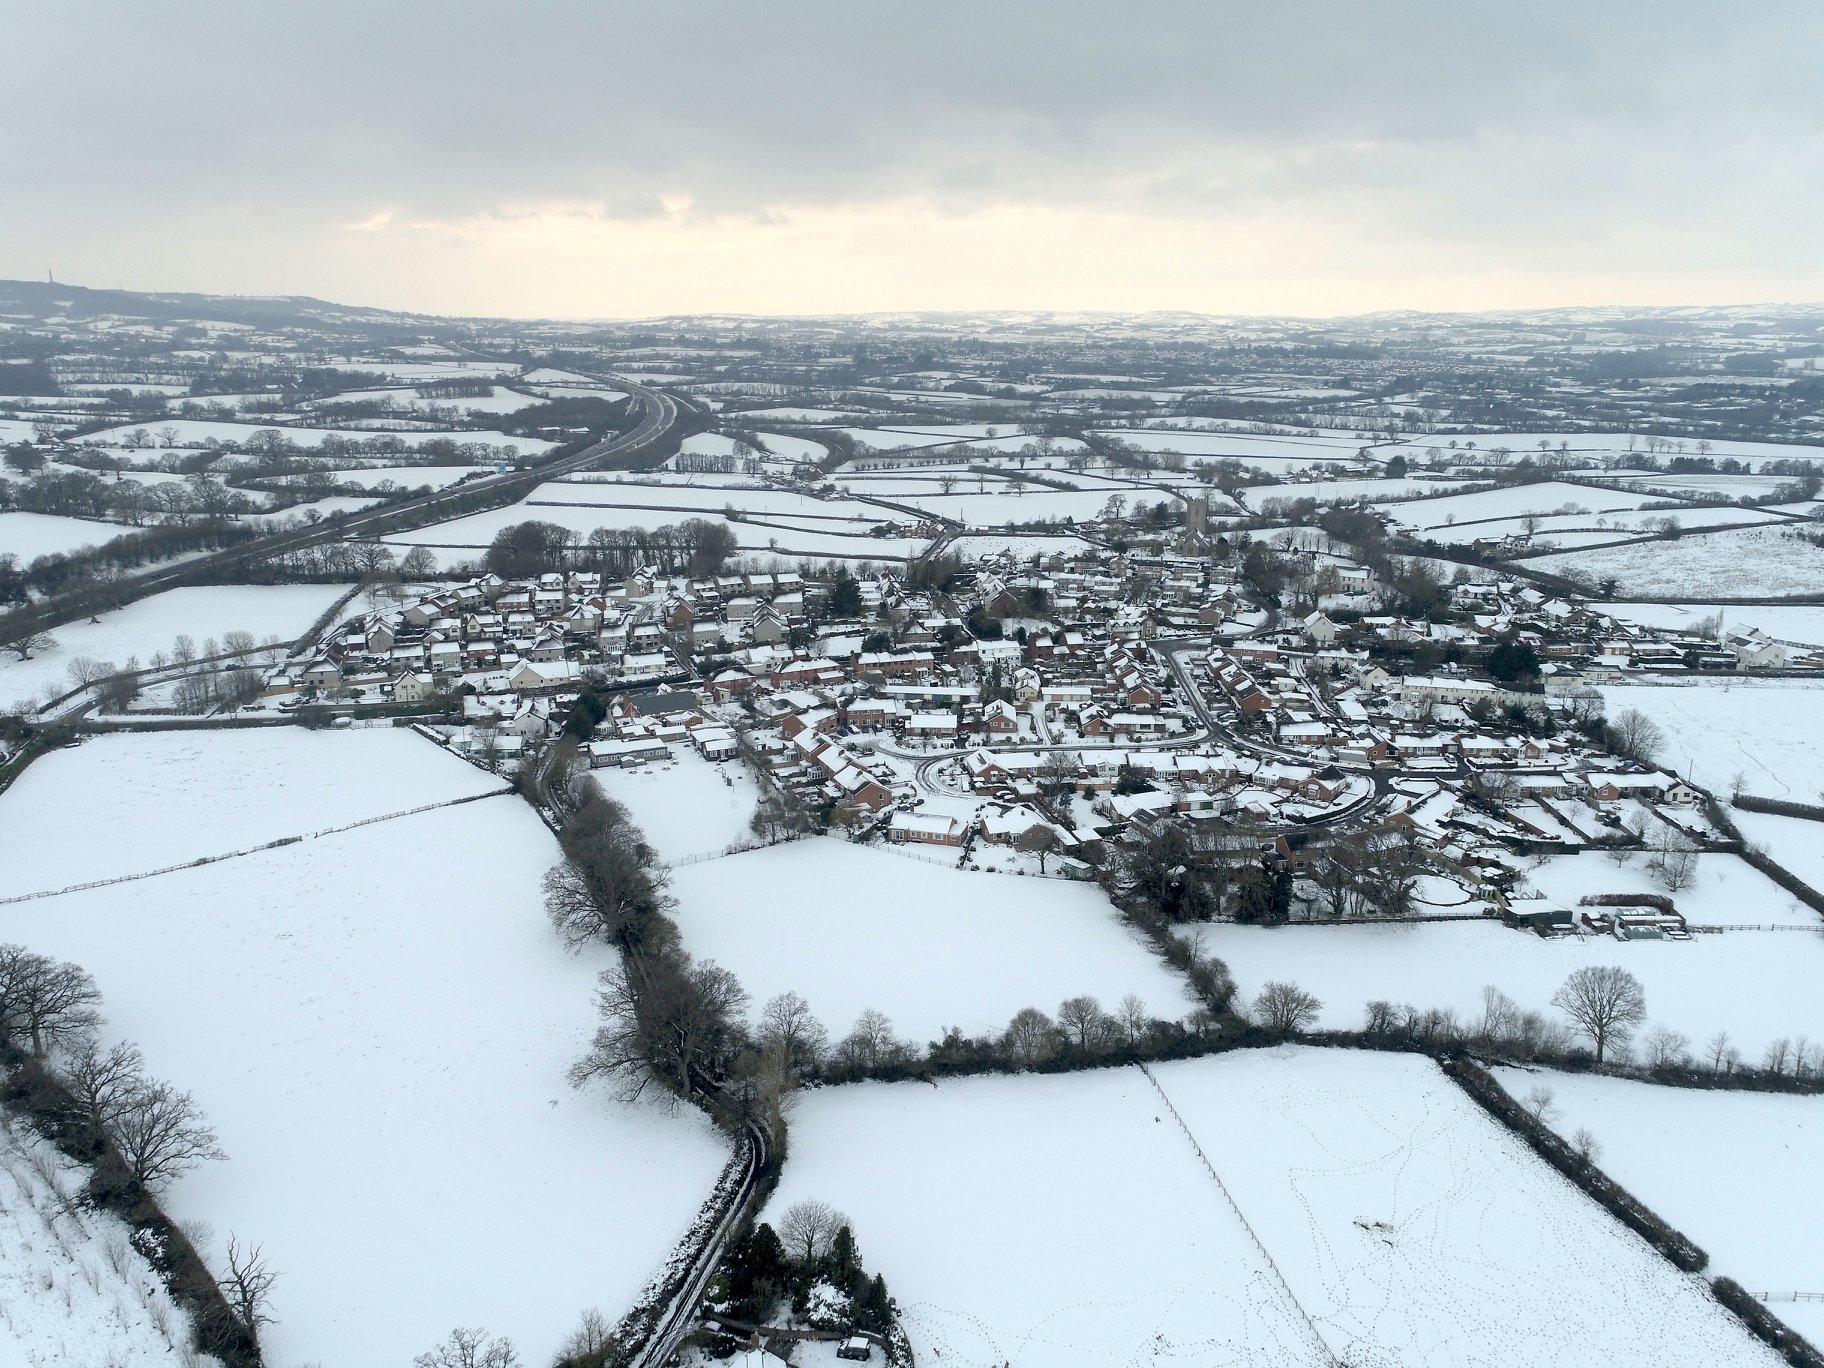 West Buckland Village in Snow